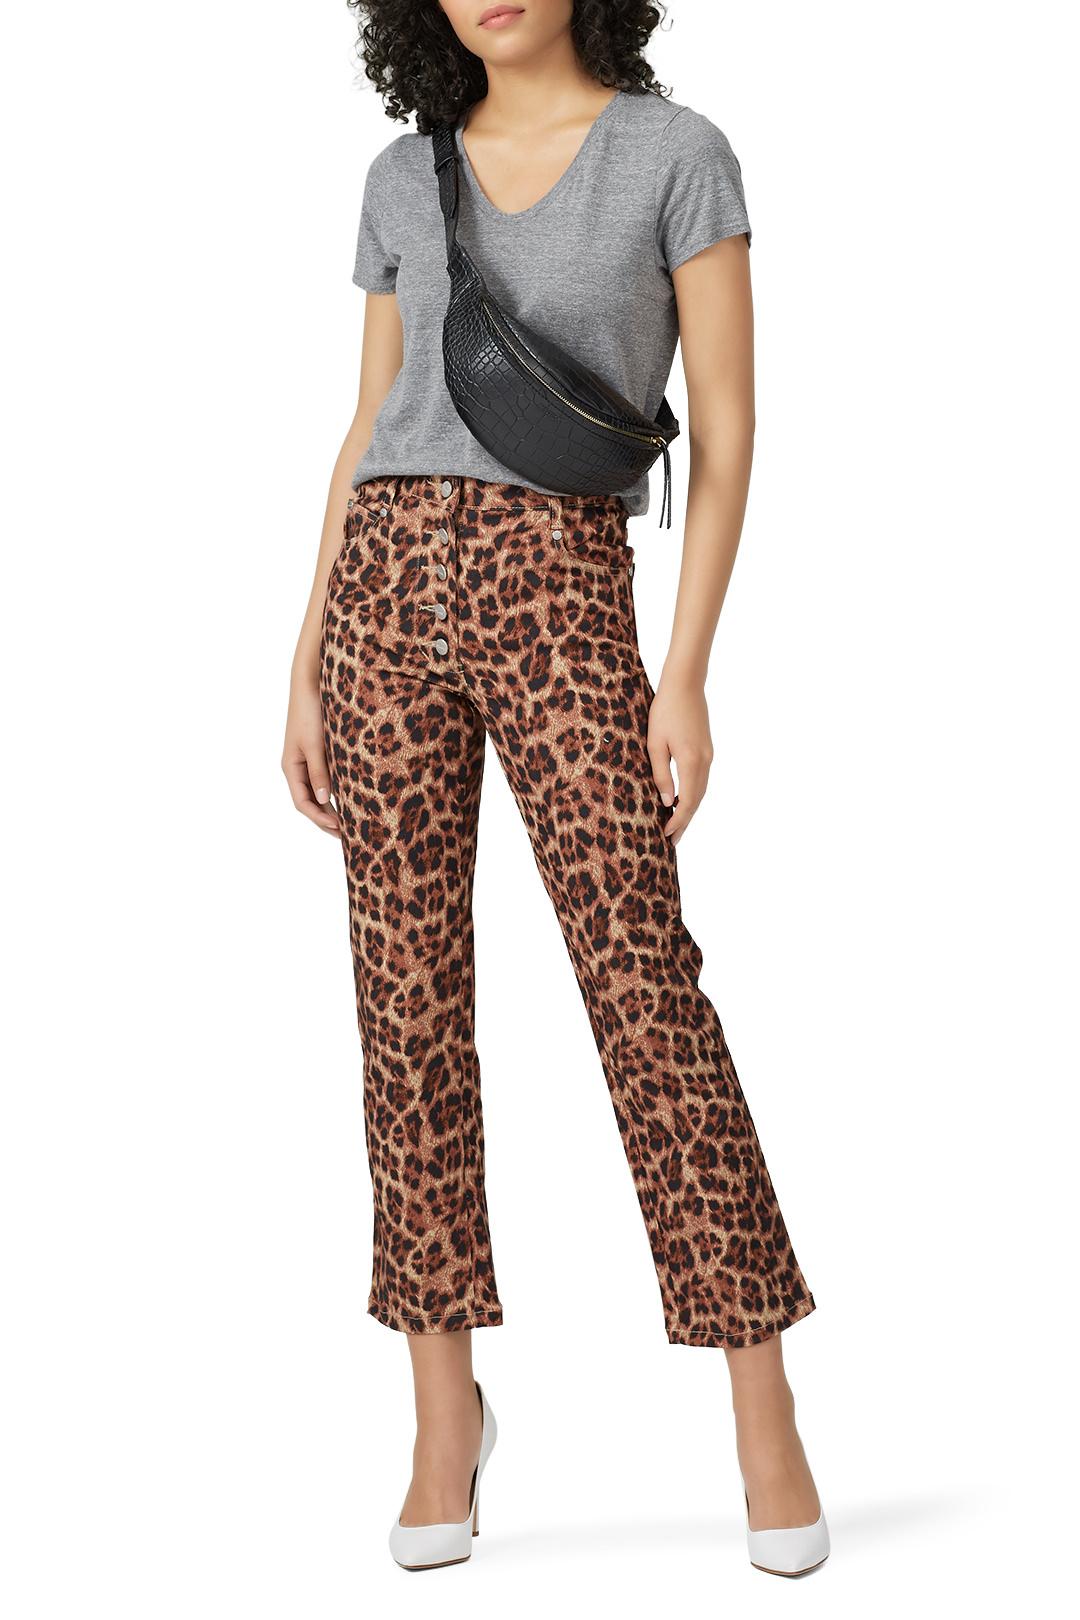 Miaou - Leopard Junior Jeans